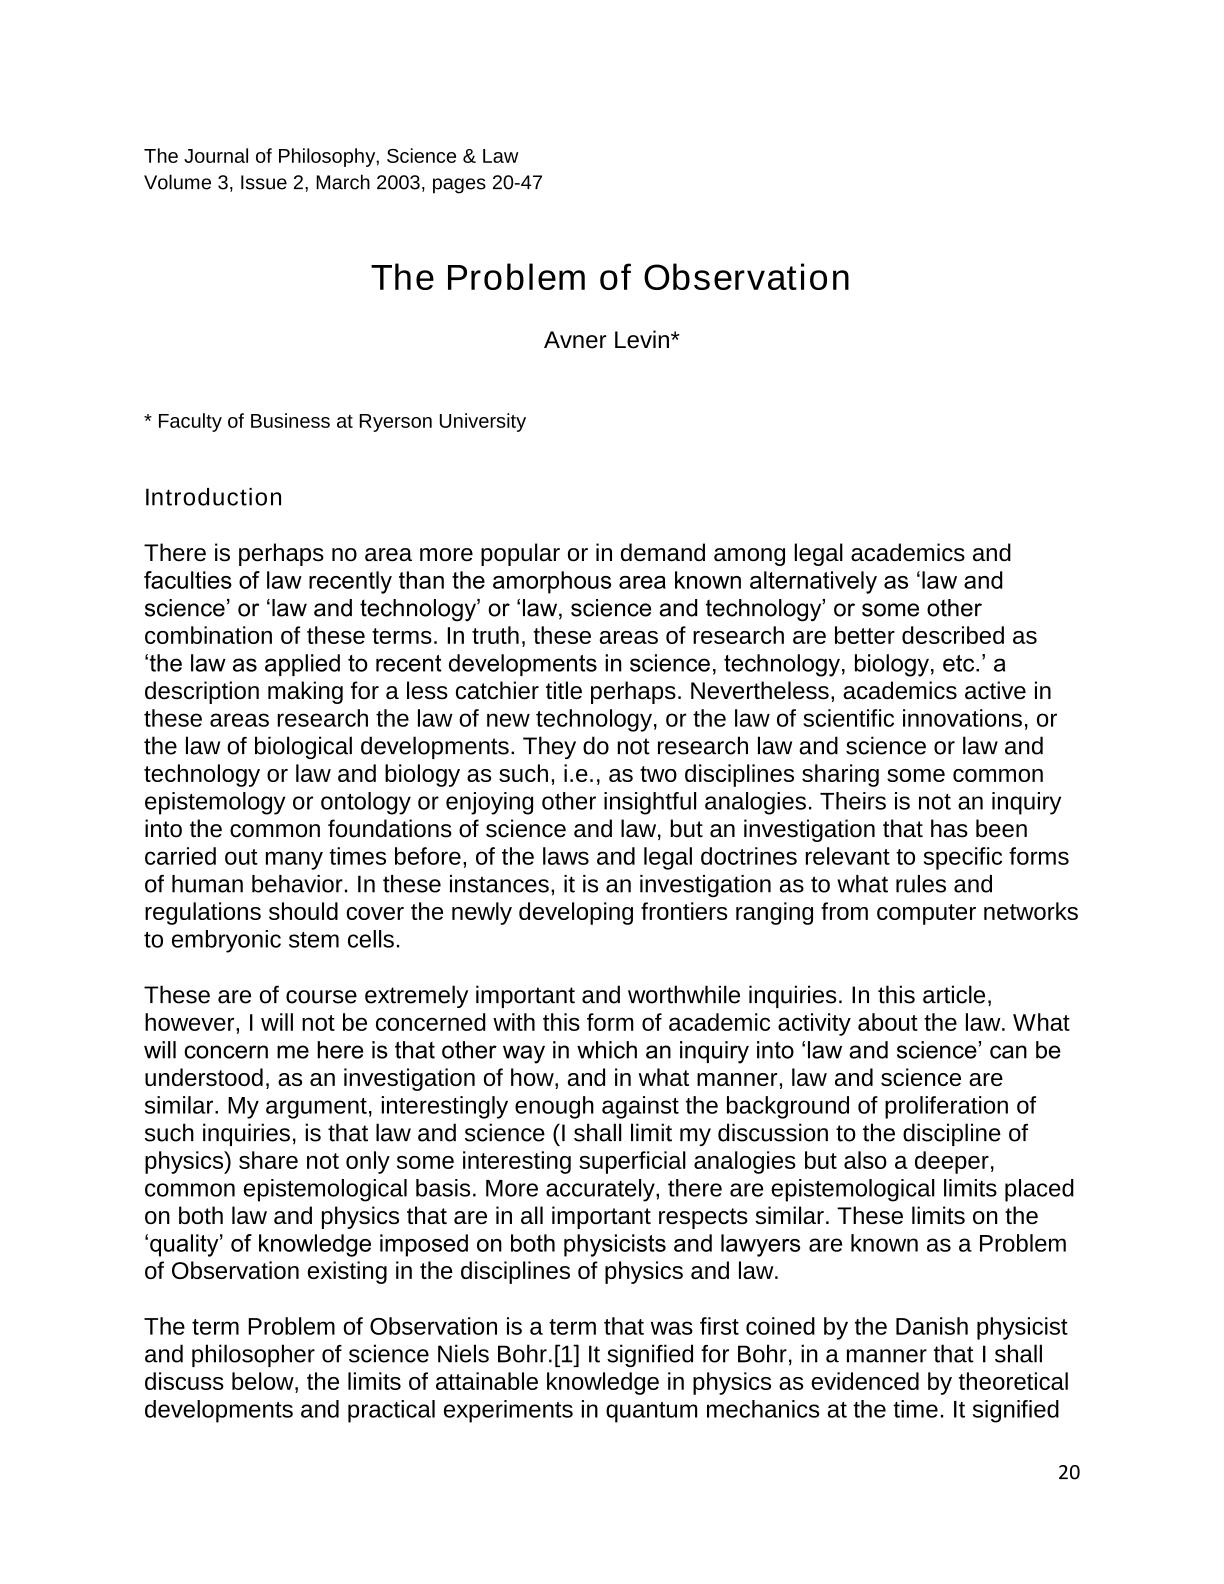 The Problem of Observation - Avner Levin - The Journal of Philosophy